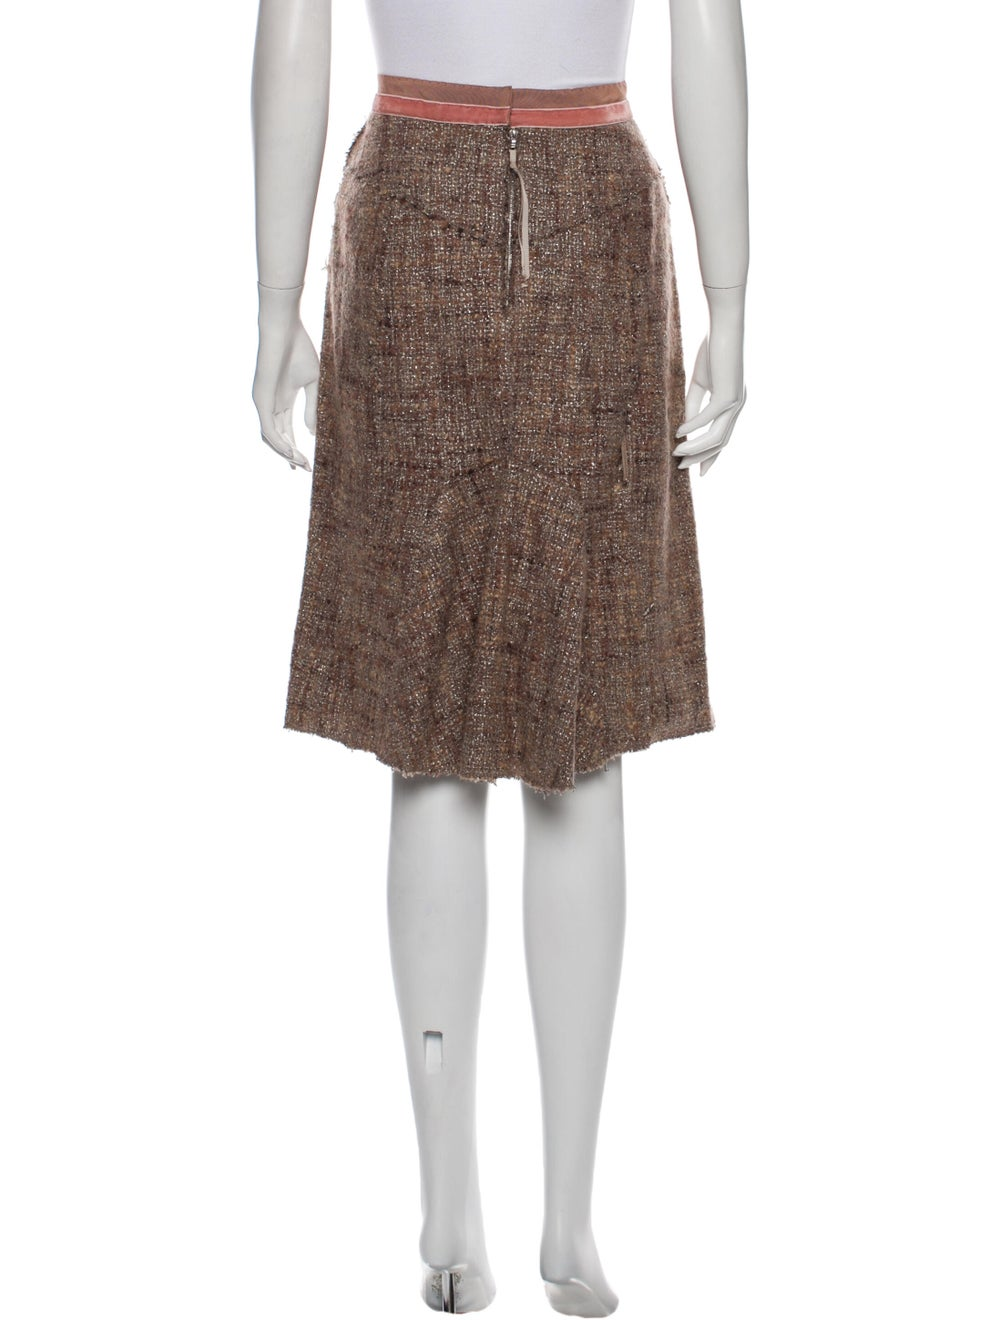 Marc Jacobs Knee-Length Skirt Metallic - image 3